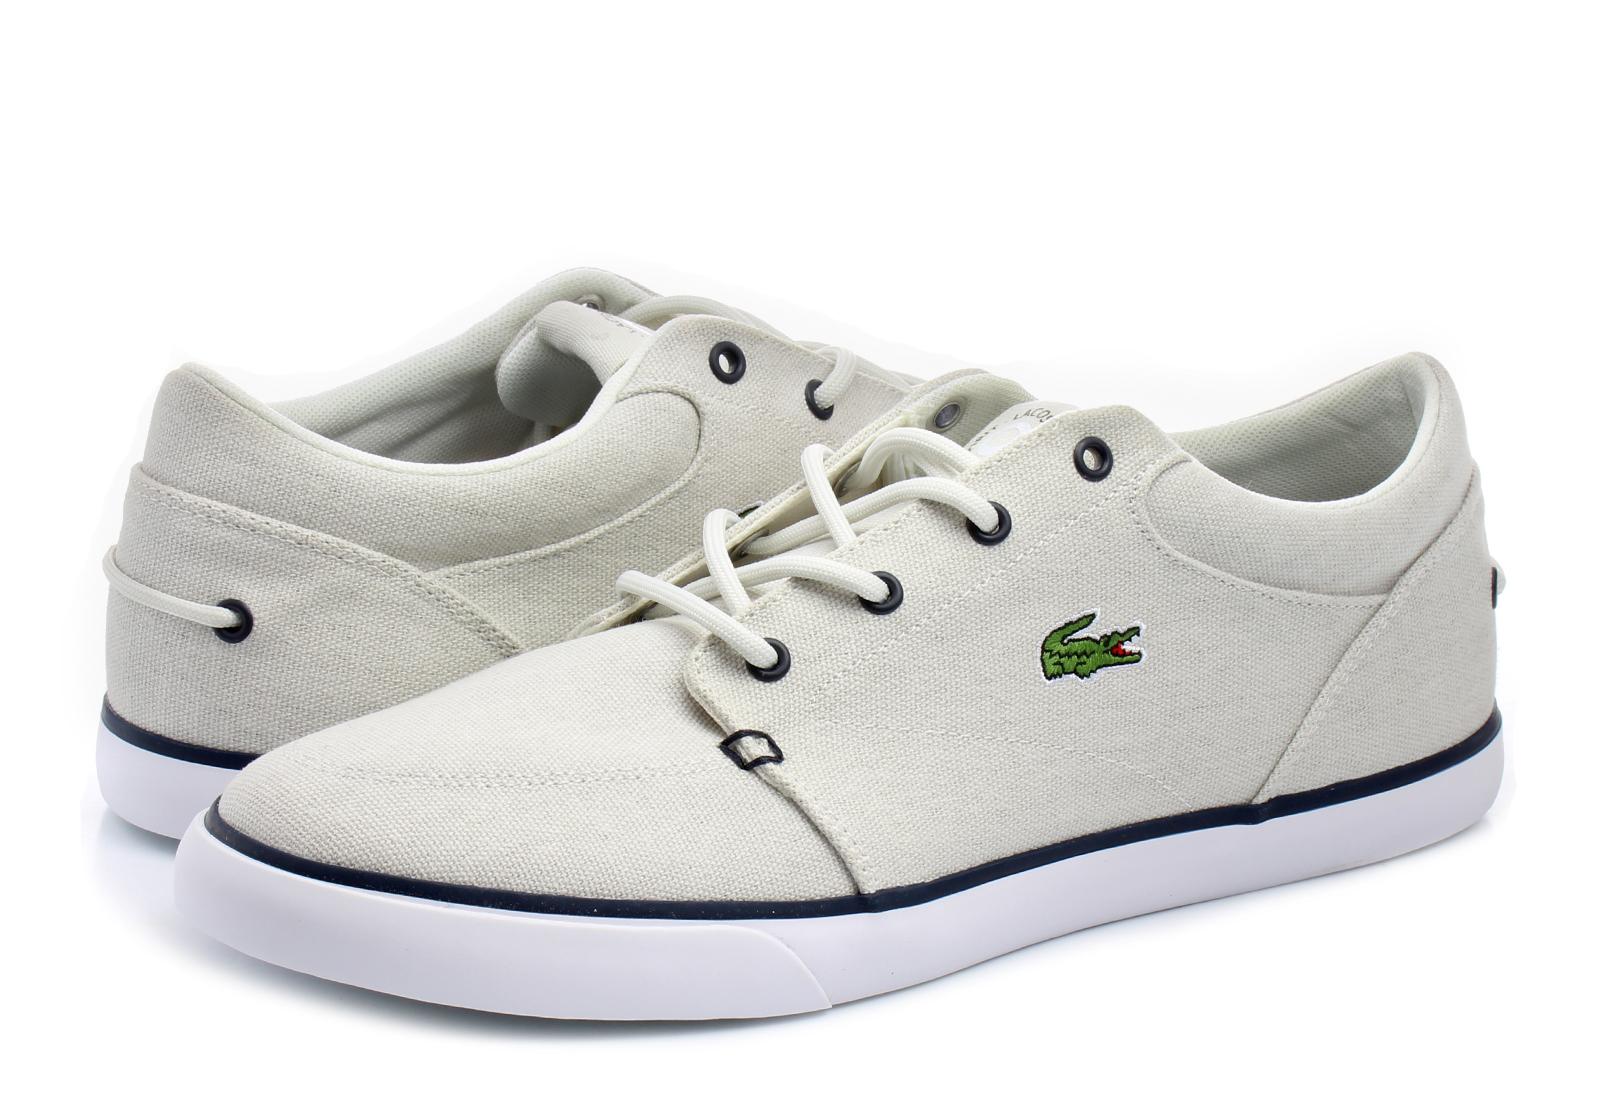 Lacoste Cipő - Bayliss - 181cam0007-wn1 - Office Shoes Magyarország f649560b63